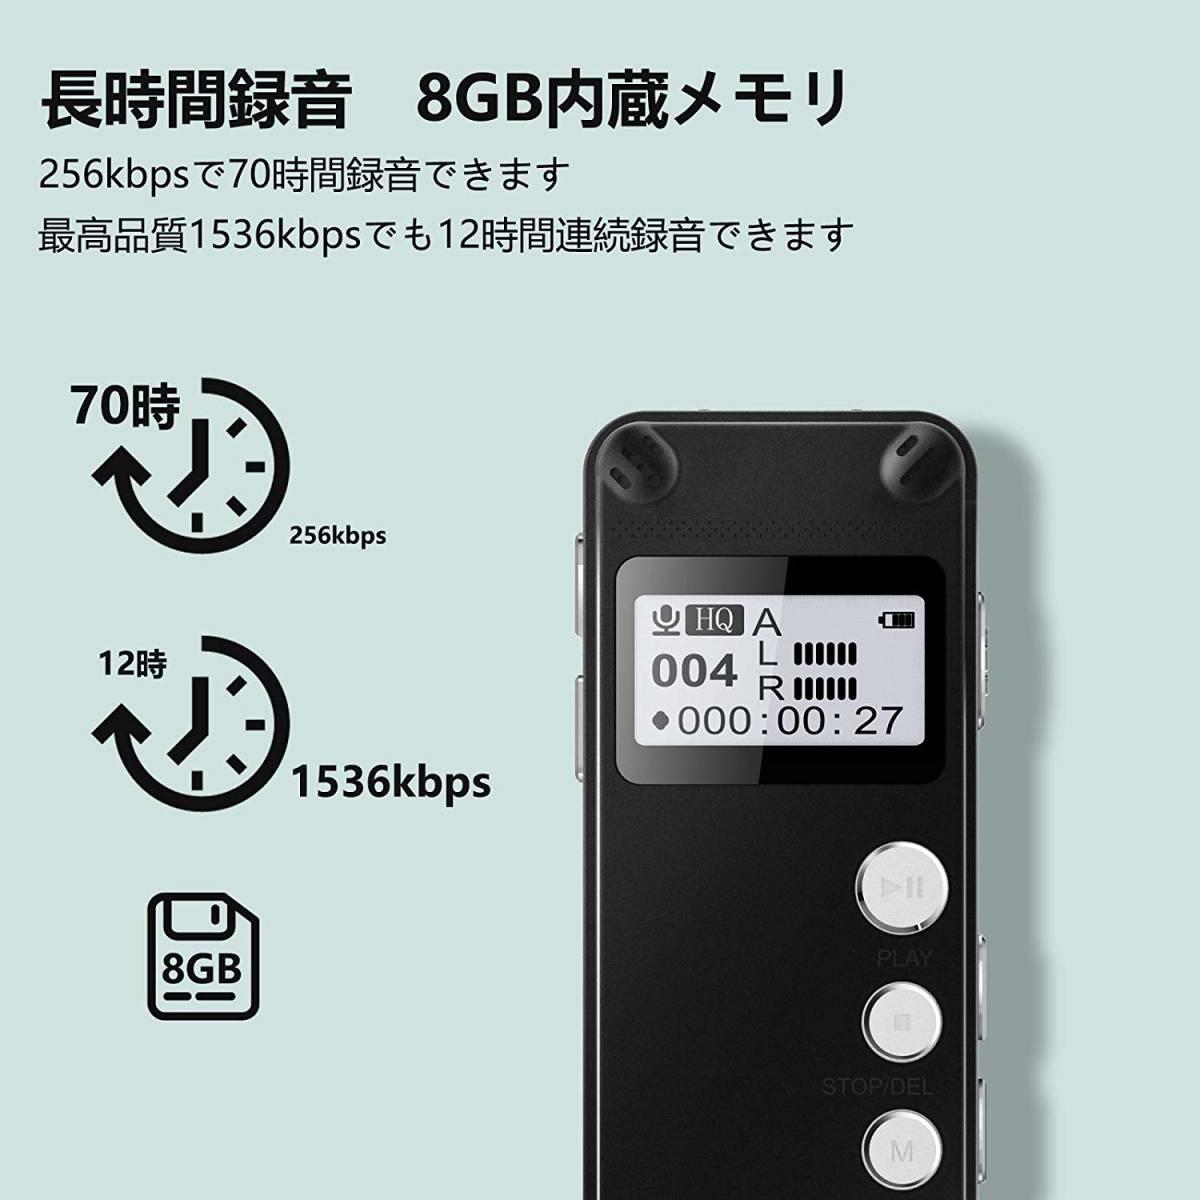 O991 新品 ボイスレコーダー ICレコーダー ノイズリダクション録音機 小型軽量MP3 高音質 大容量長時間録音 音声検出 定時録音_画像4